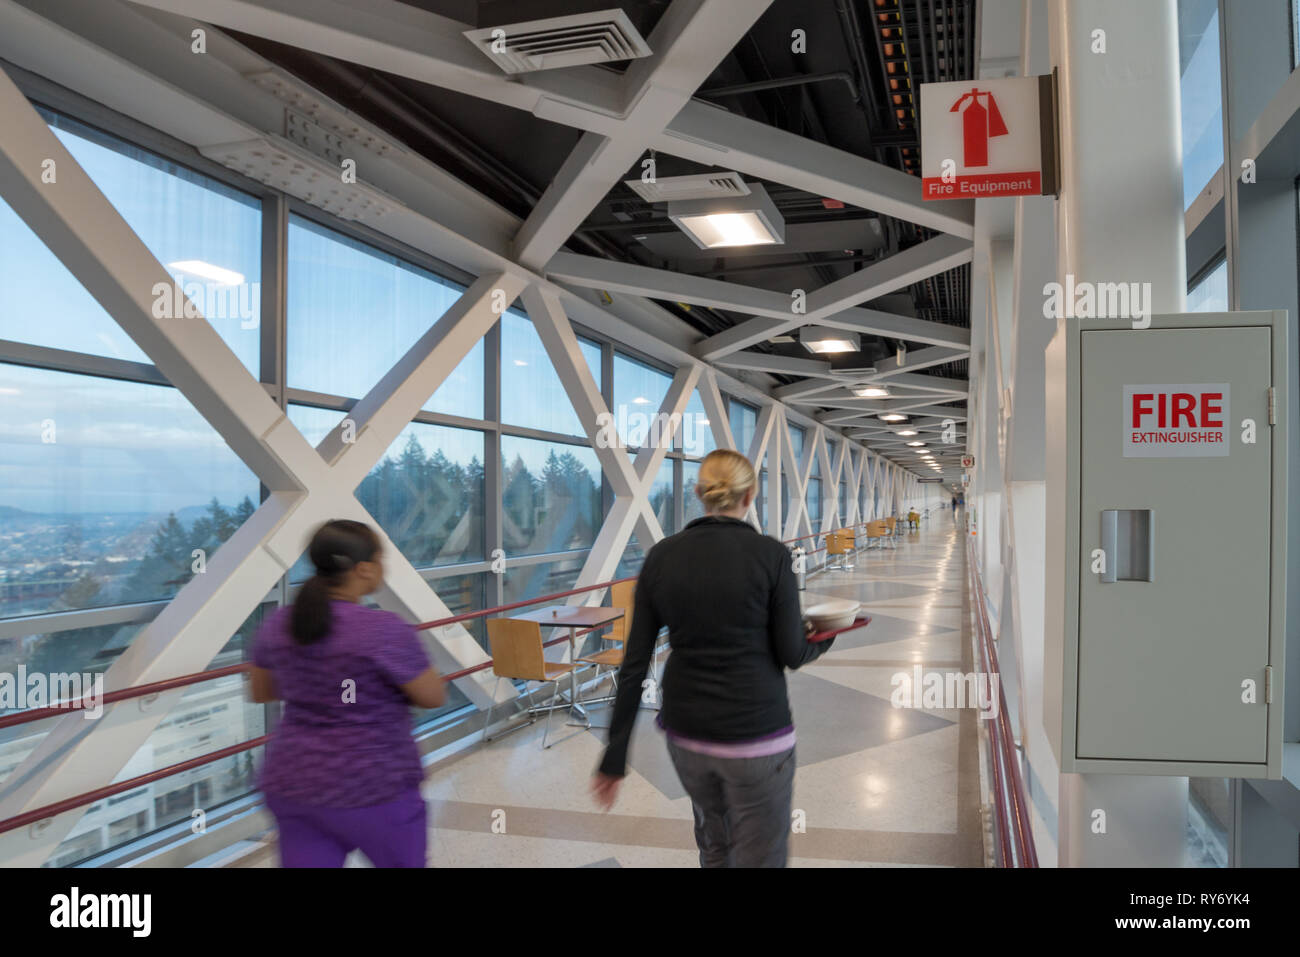 Fire extinguisher in a sky bridge at Oregon Health Sciences University, Portland, Oregon. - Stock Image